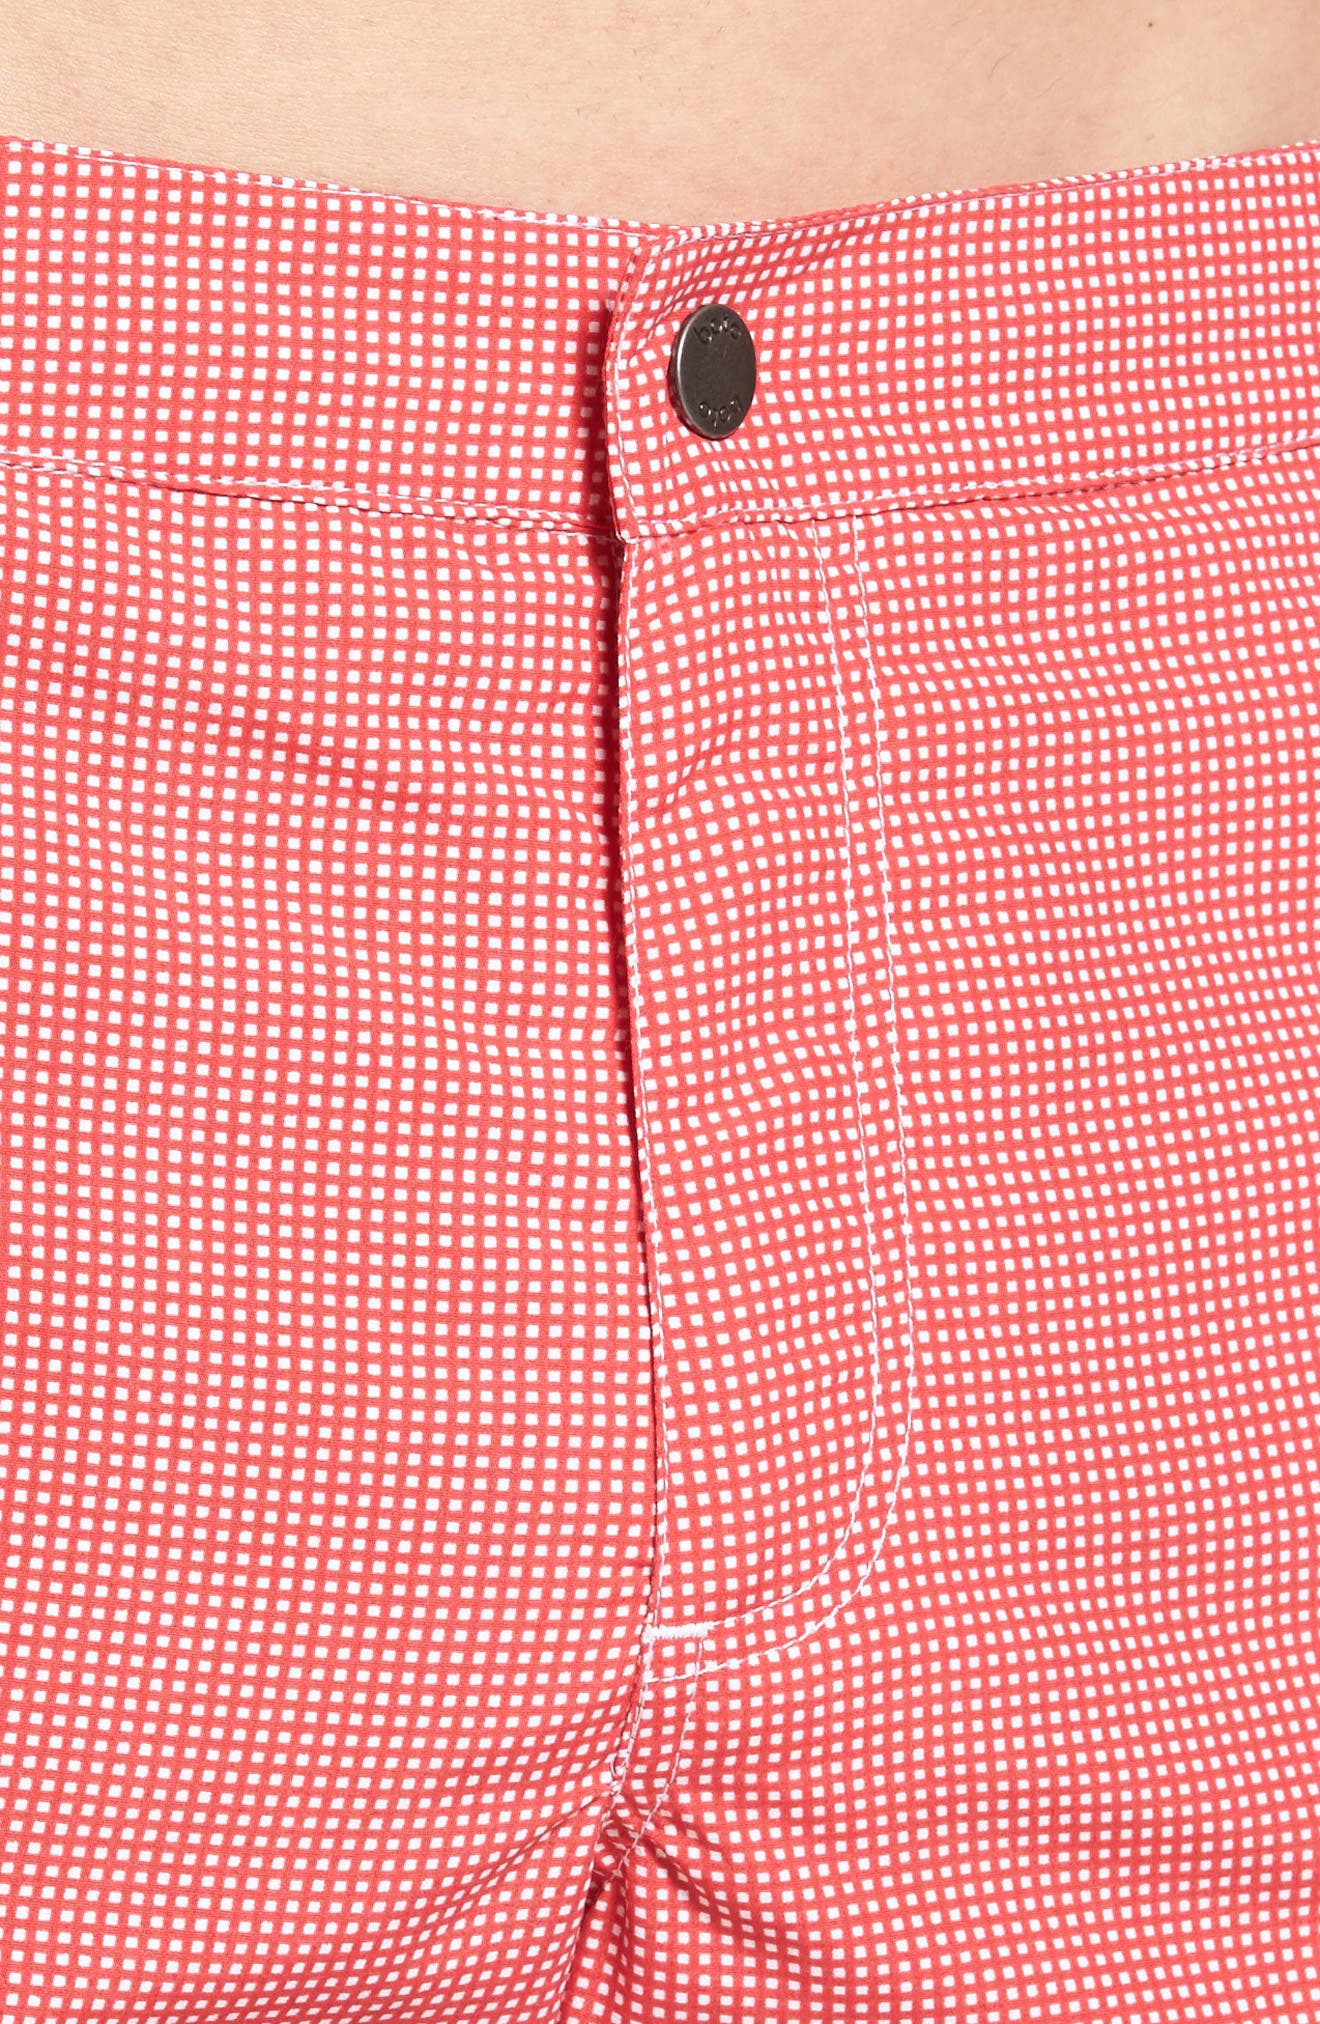 Aruba Microcheck Tailored Fit 8.5 Inch Swim Trunks,                             Alternate thumbnail 4, color,                             611